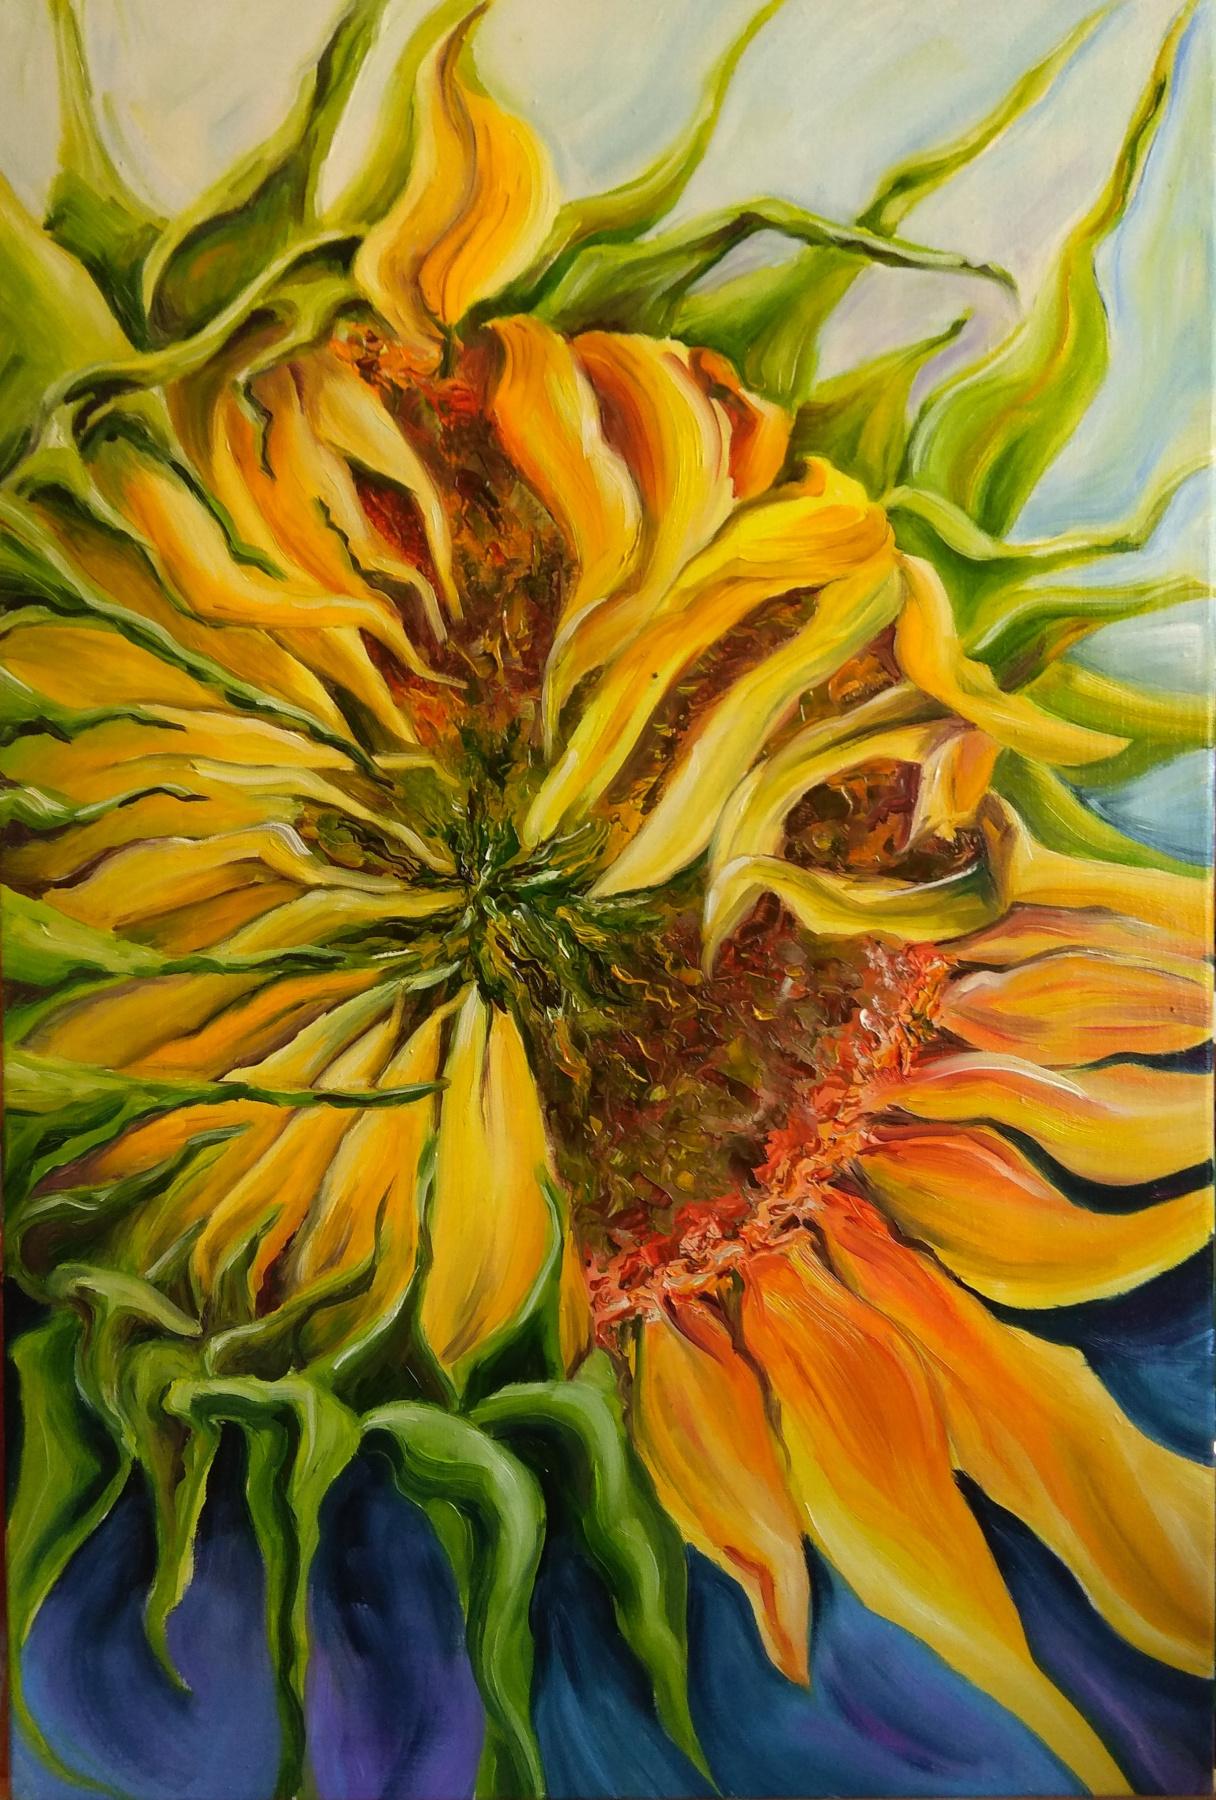 Nadezhda Anatolyevna Poleva. Sunflower